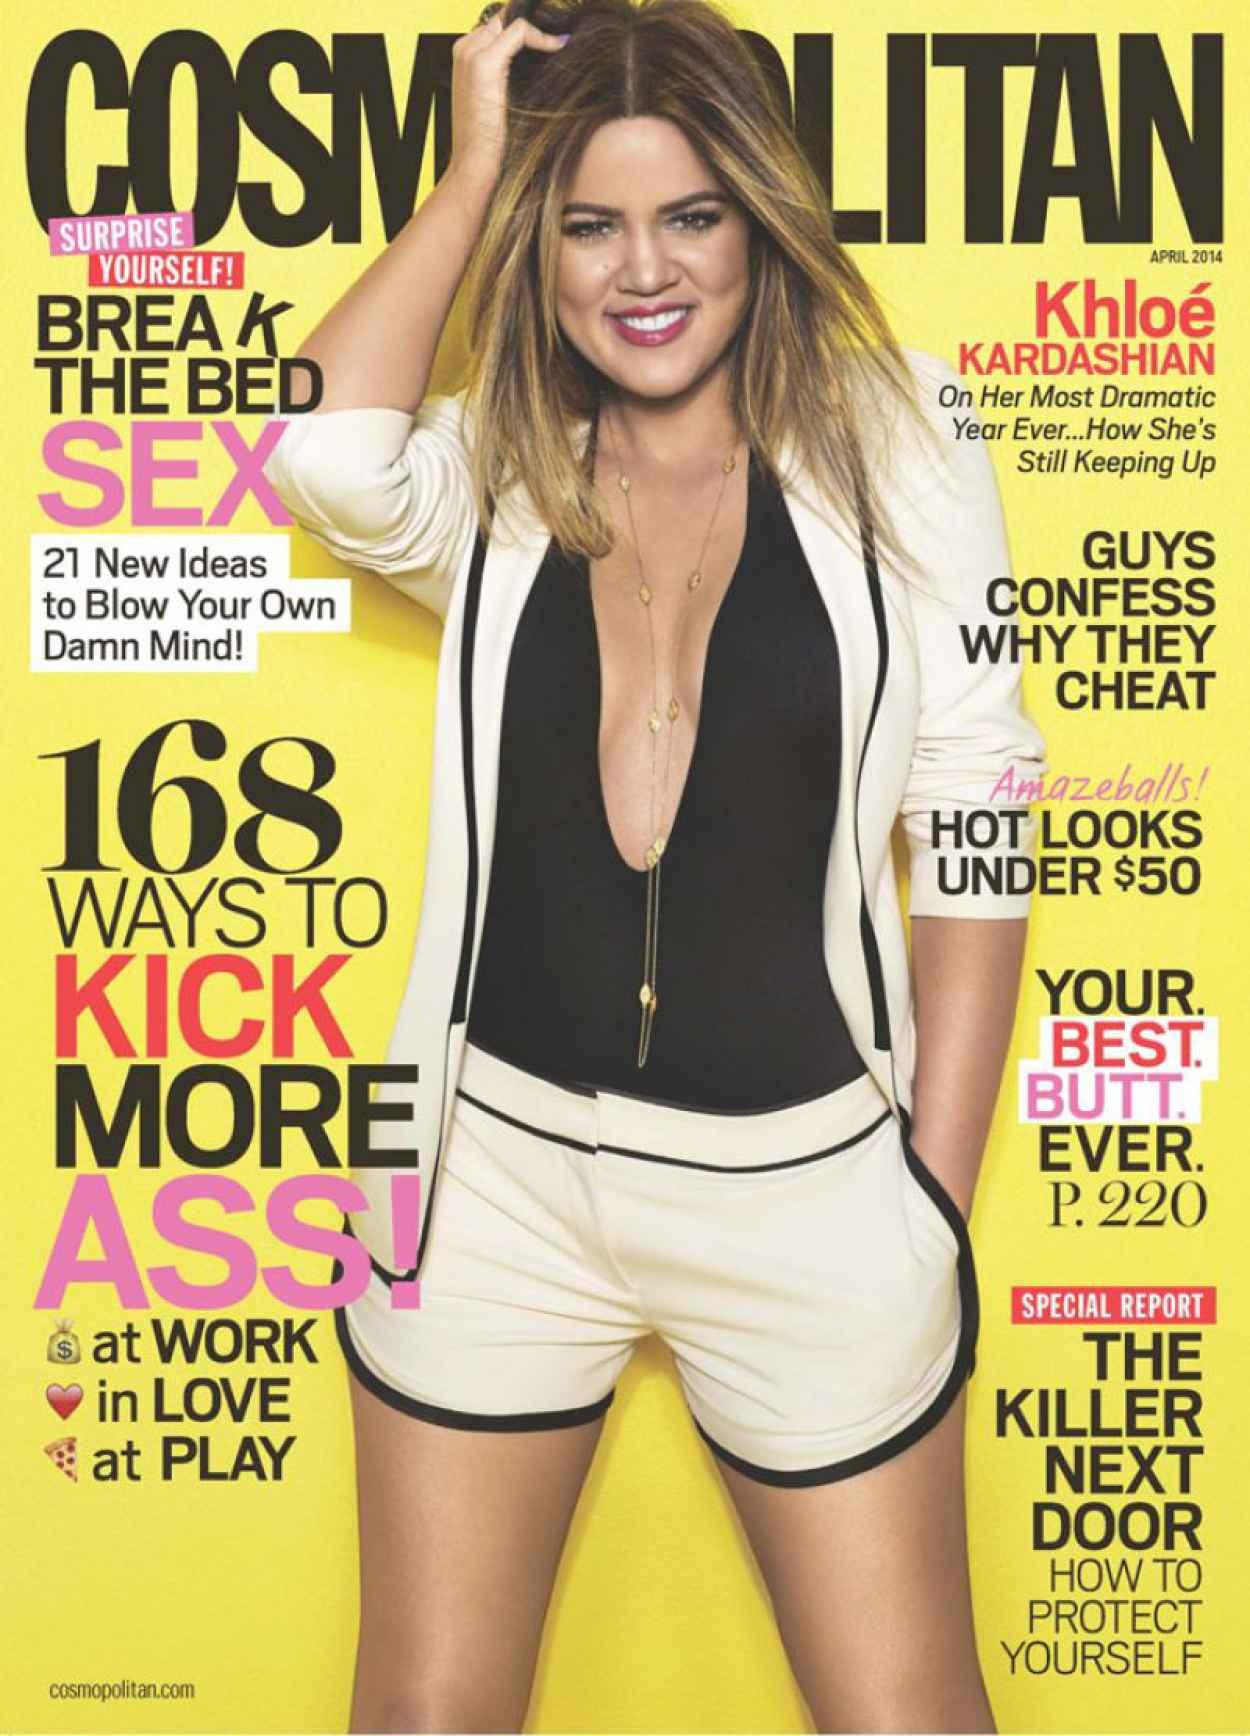 Khloe Kardashian - Cosmopolitan Magazine - April 2015 Issue-1